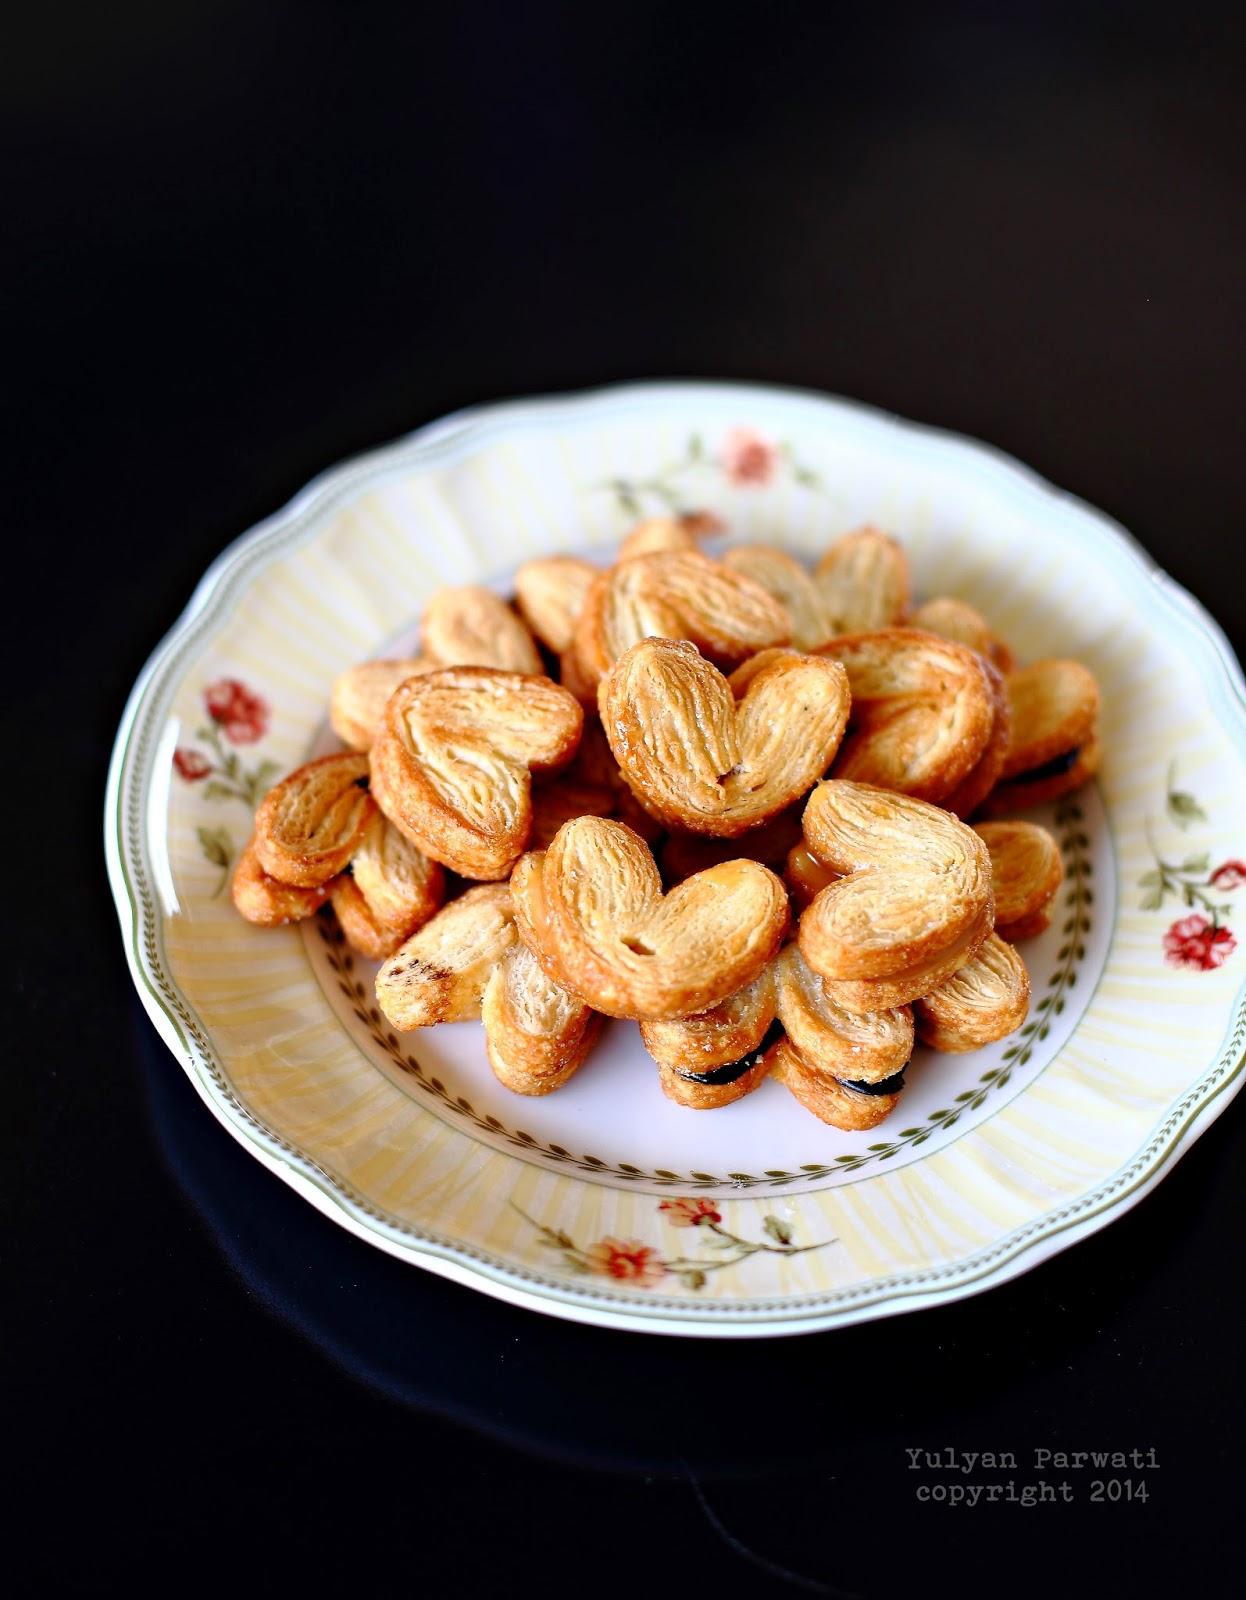 Cooking With Love Mr Muscle Kitchen Orange Pouch 400ml Minimum  2 Item Yang Sama Khusus Area Pulau Jawa Mini Genji Pie Sanwich Dengan Dua Isian Berbeda Yaitu Chilli Chocolate Dan Caramel Perpaduan Antara Ternyata Membuat Sesasi Rasa